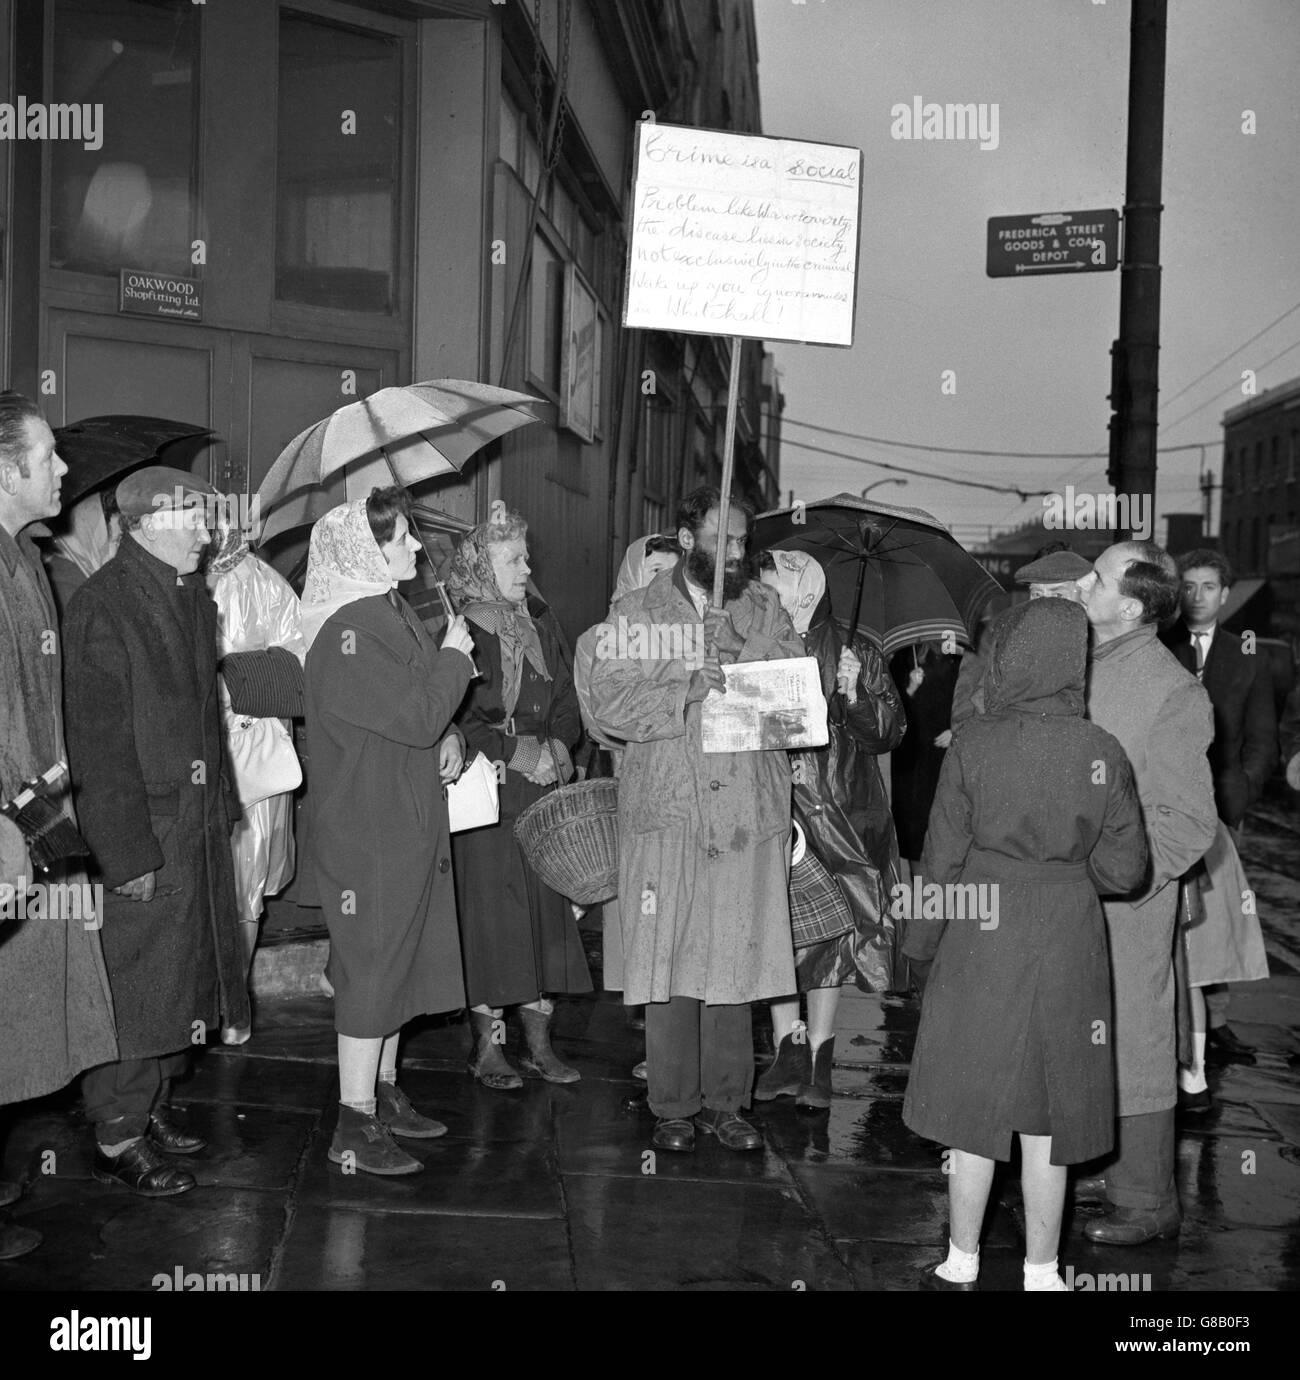 Public Execution Black And White Stock Photos Amp Images Alamy